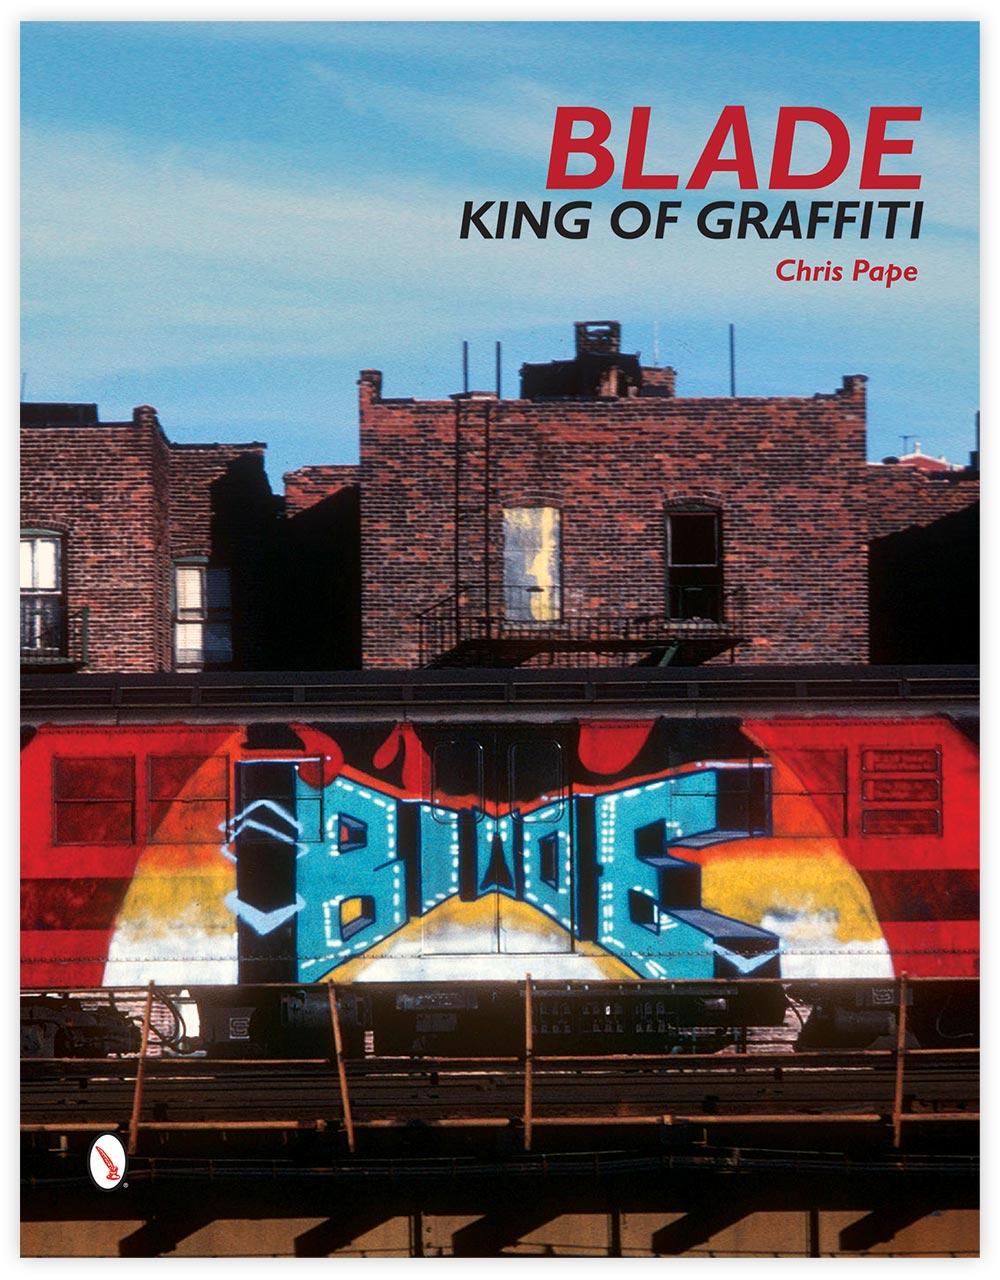 urban-media-blade-king-of-graffiti-buch-1630-zoom-0.jpg